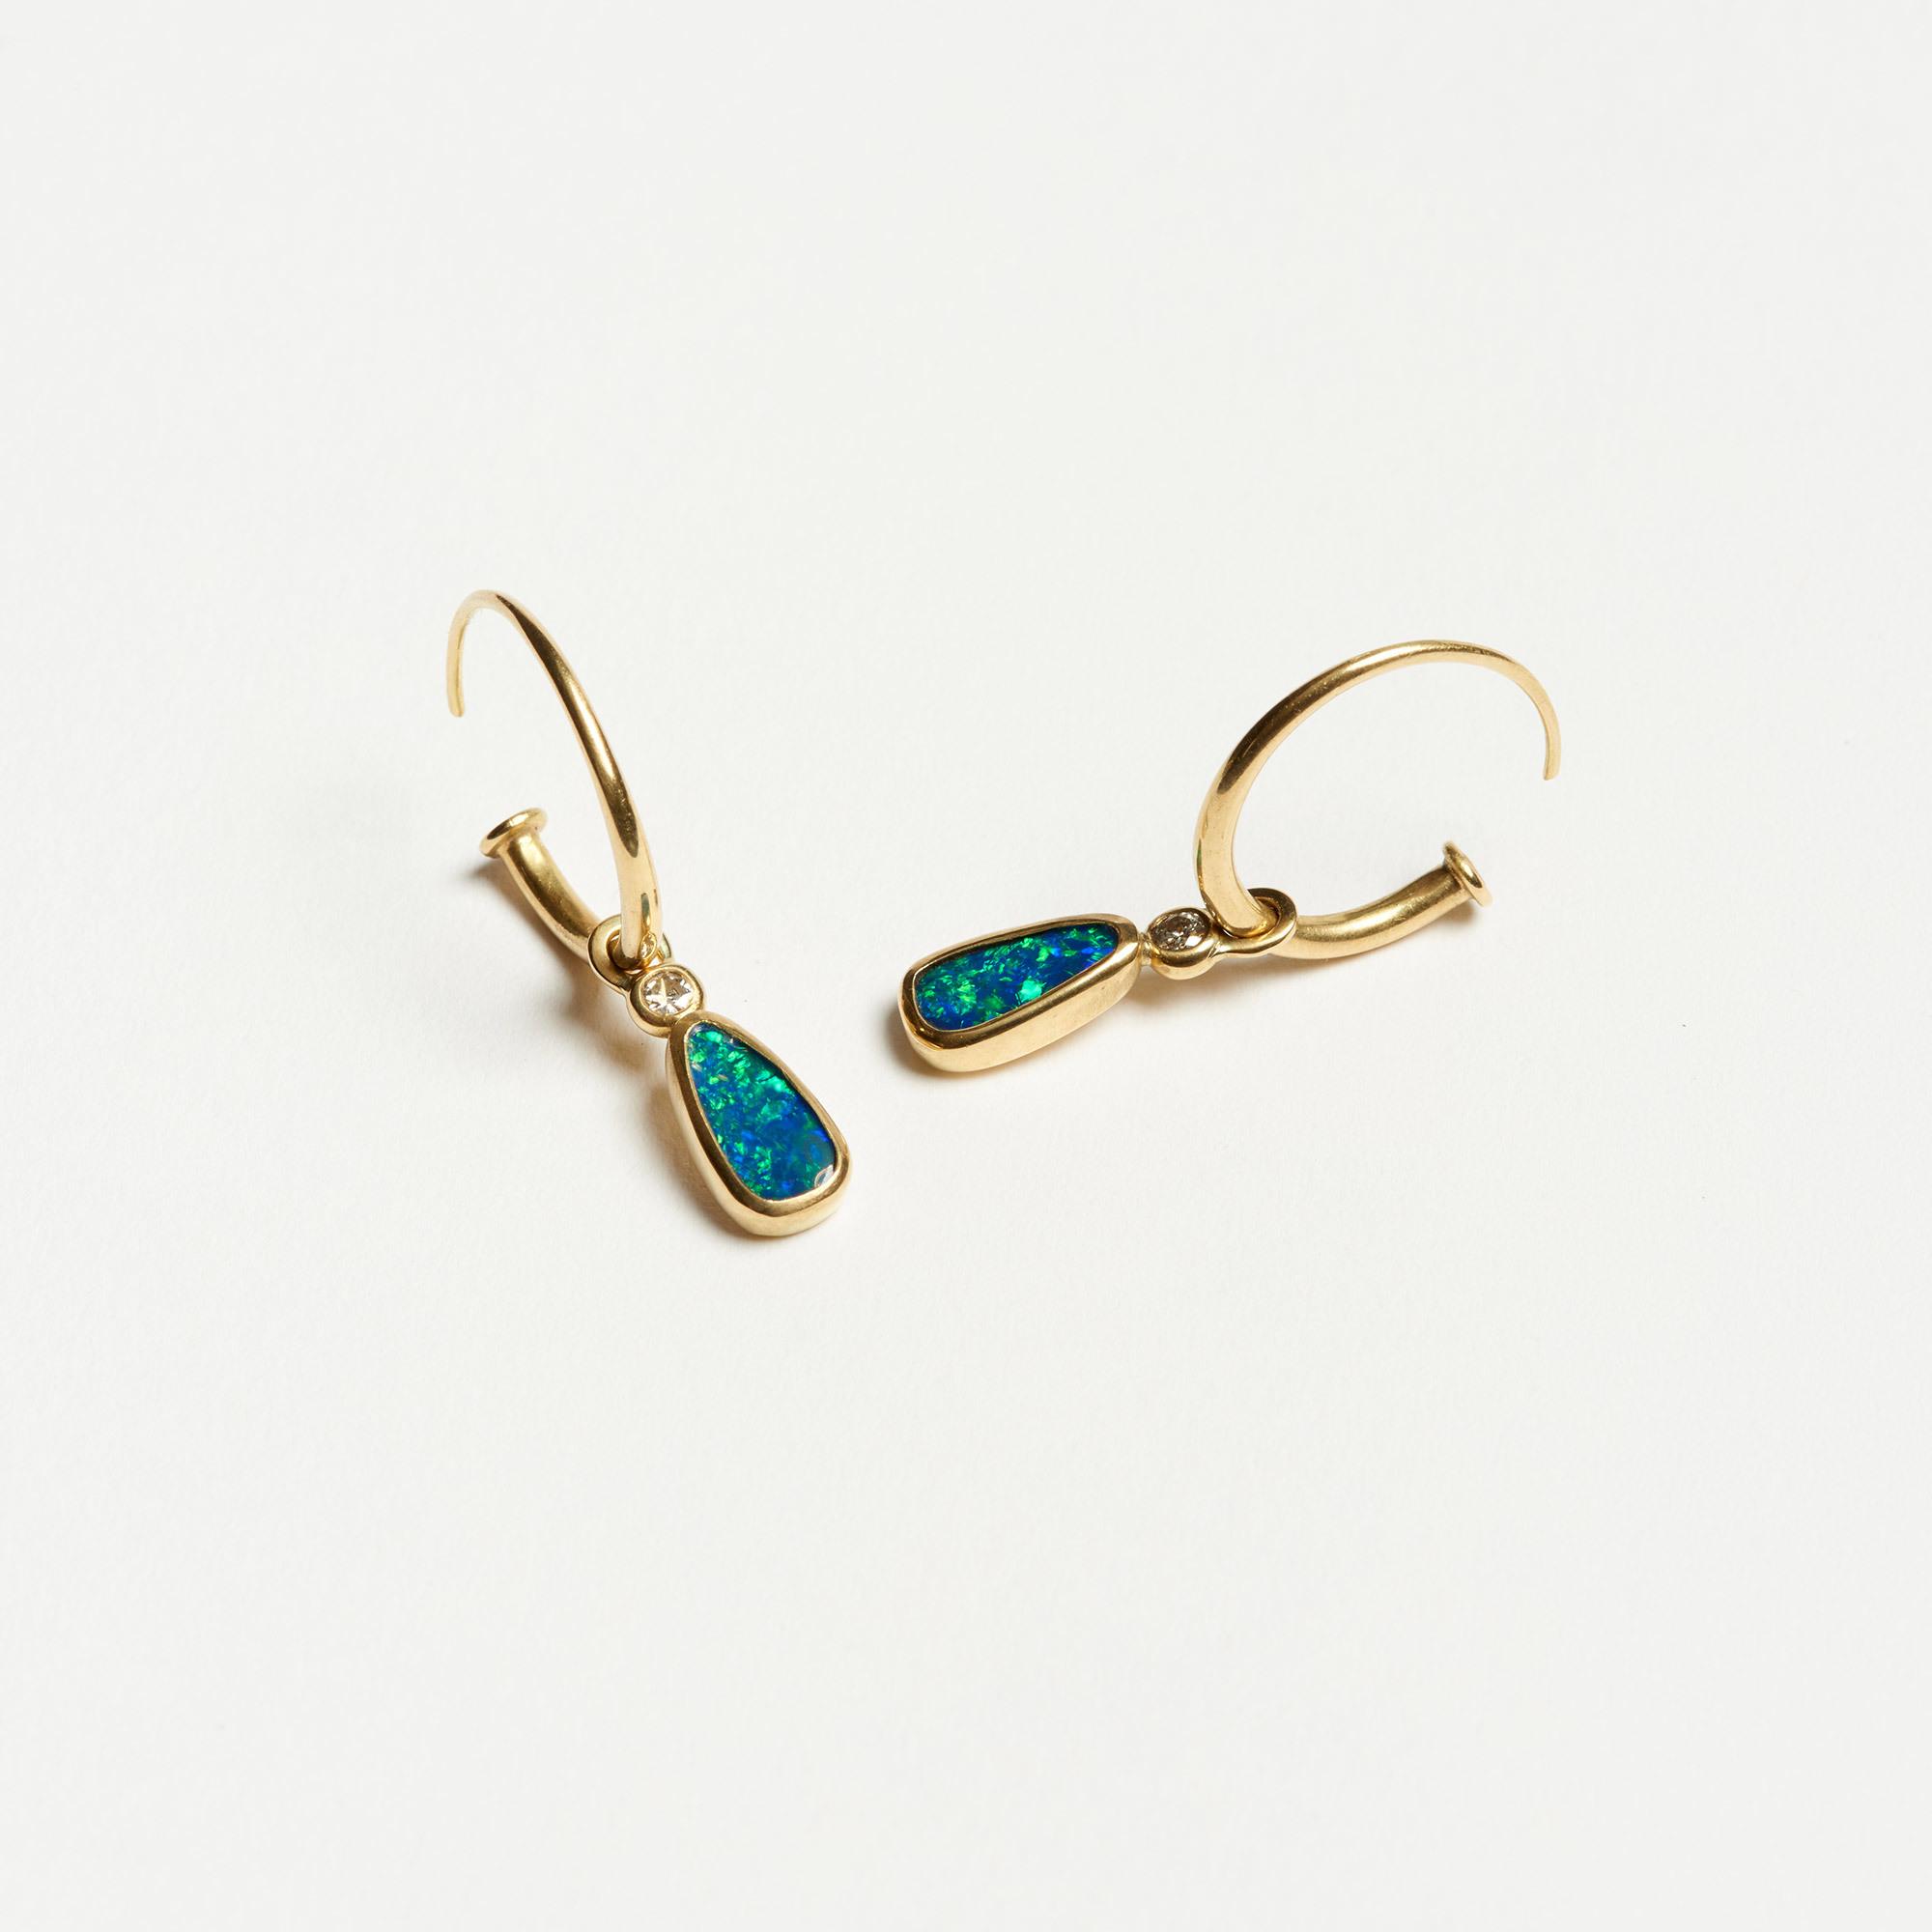 13dbcd9a2 Abby Mosseri 18K Gold Freeform Opal & Diamond Earrings | The Garnered